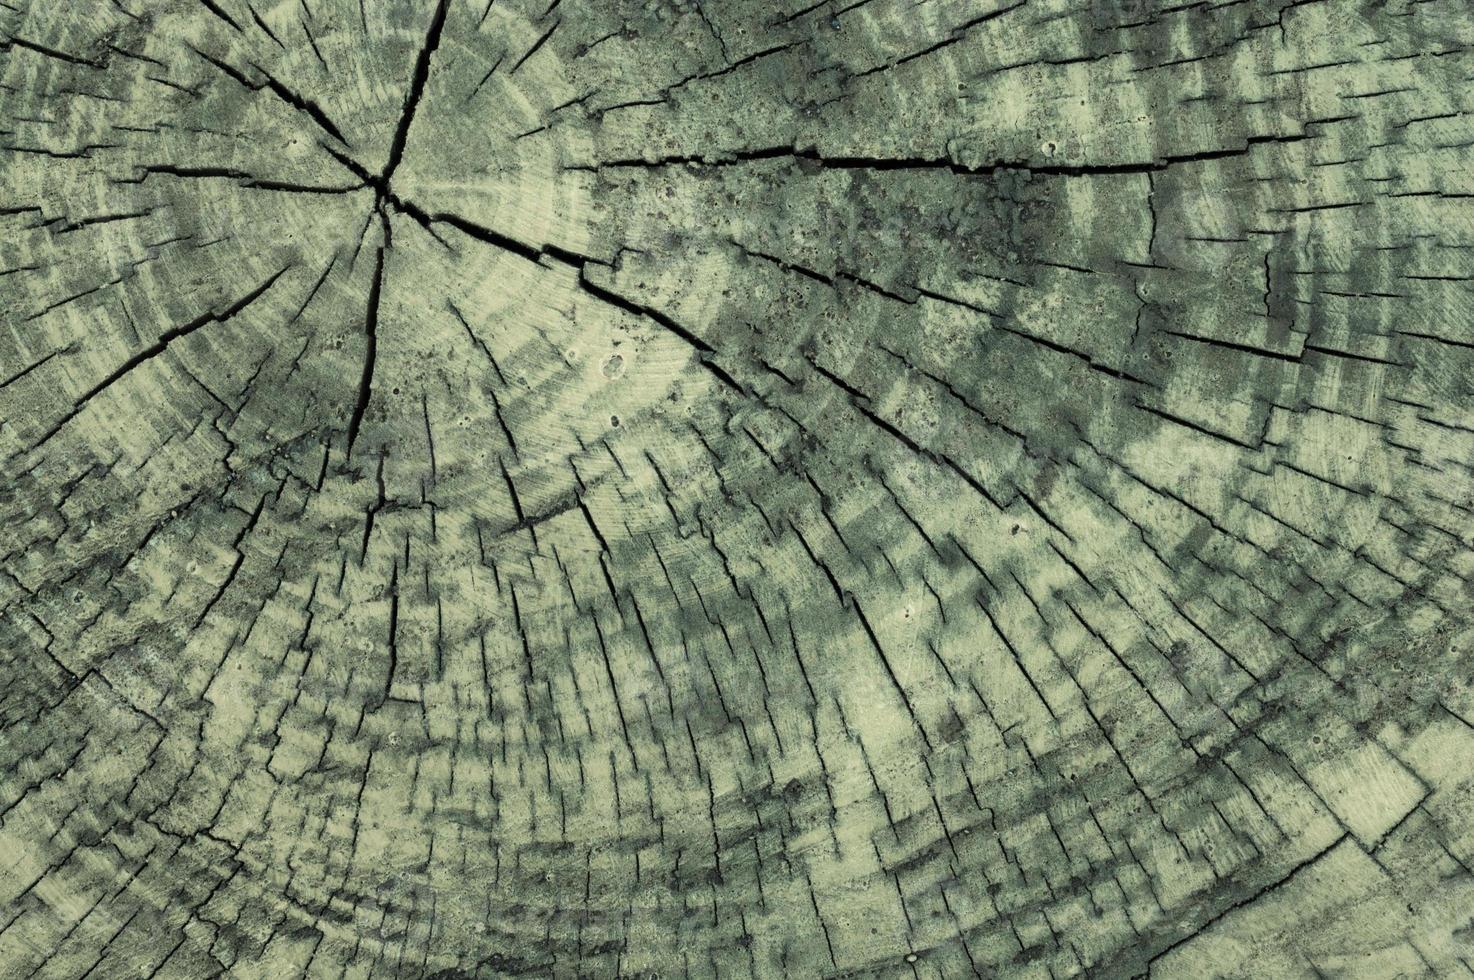 Holz Hintergrund Textur. grau lackiertes Holz. foto